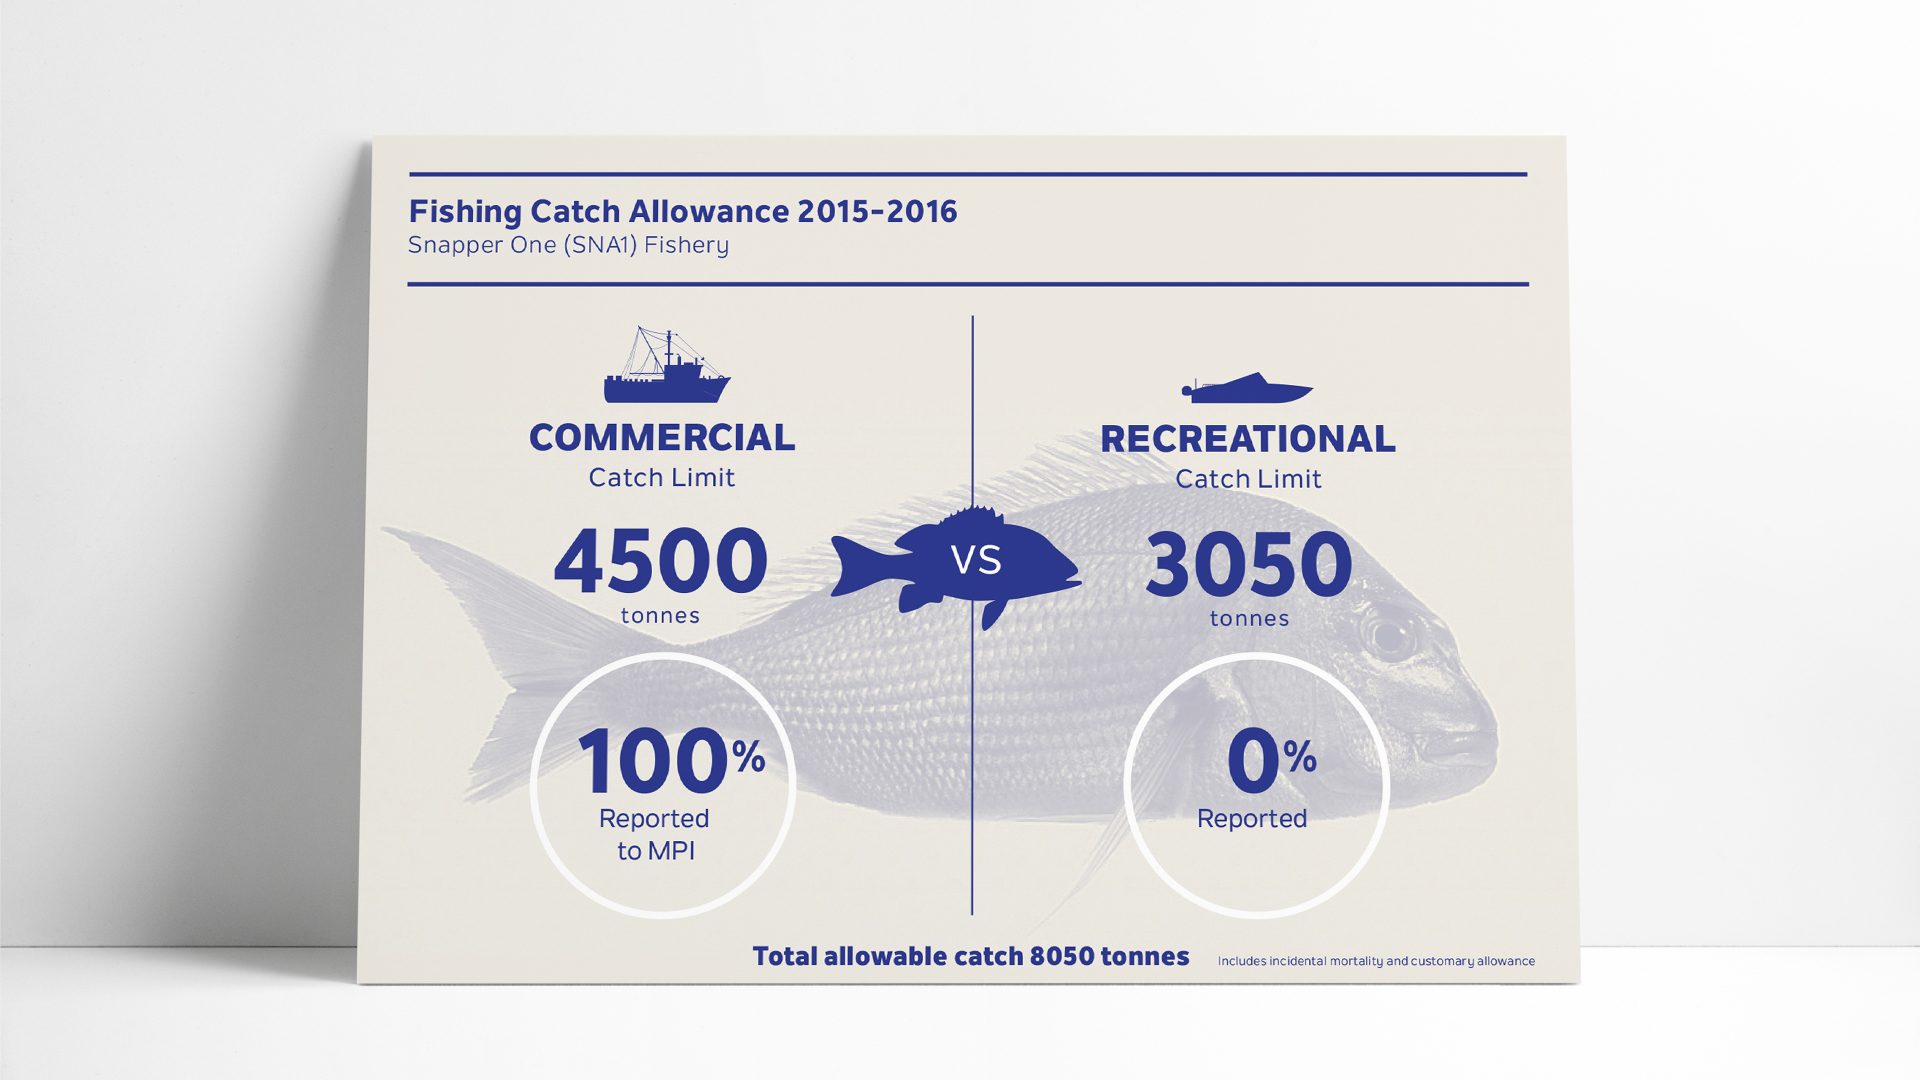 Snapper 1 fishery catch allowance 1920x1080.jpg